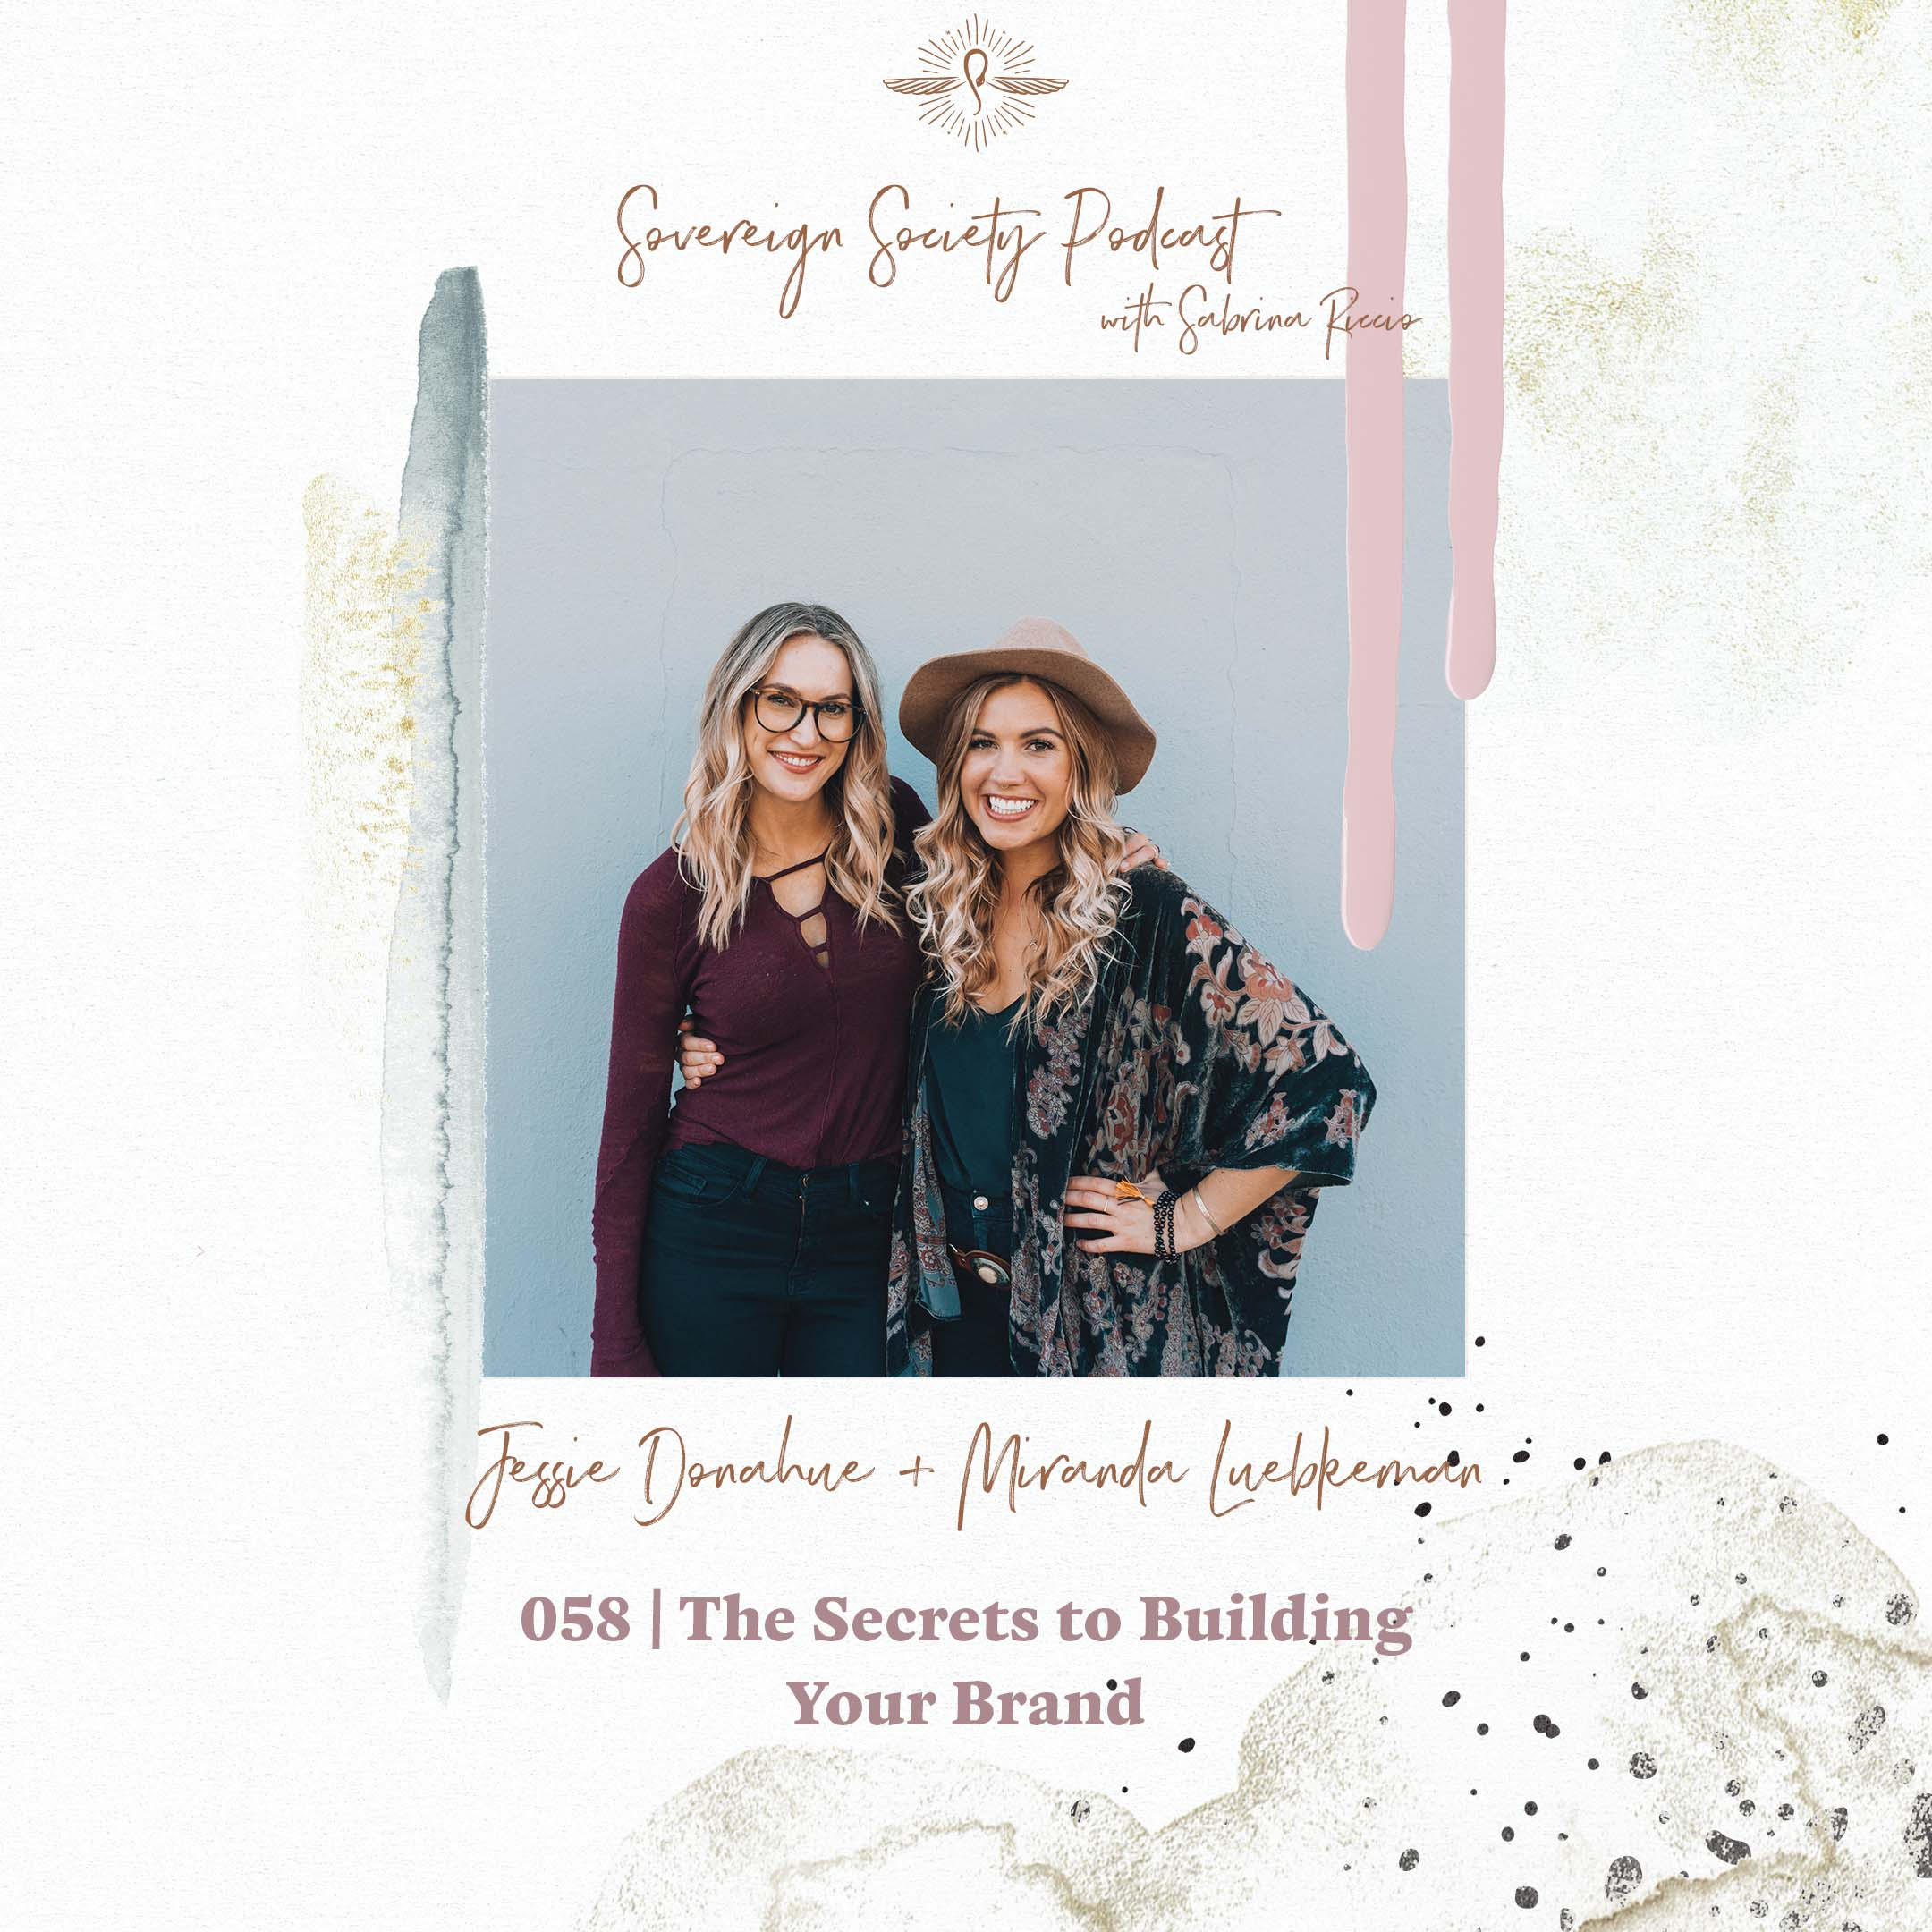 058   The Secrets to Building Your Brand / Jessie Donahue + Miranda Luebkeman